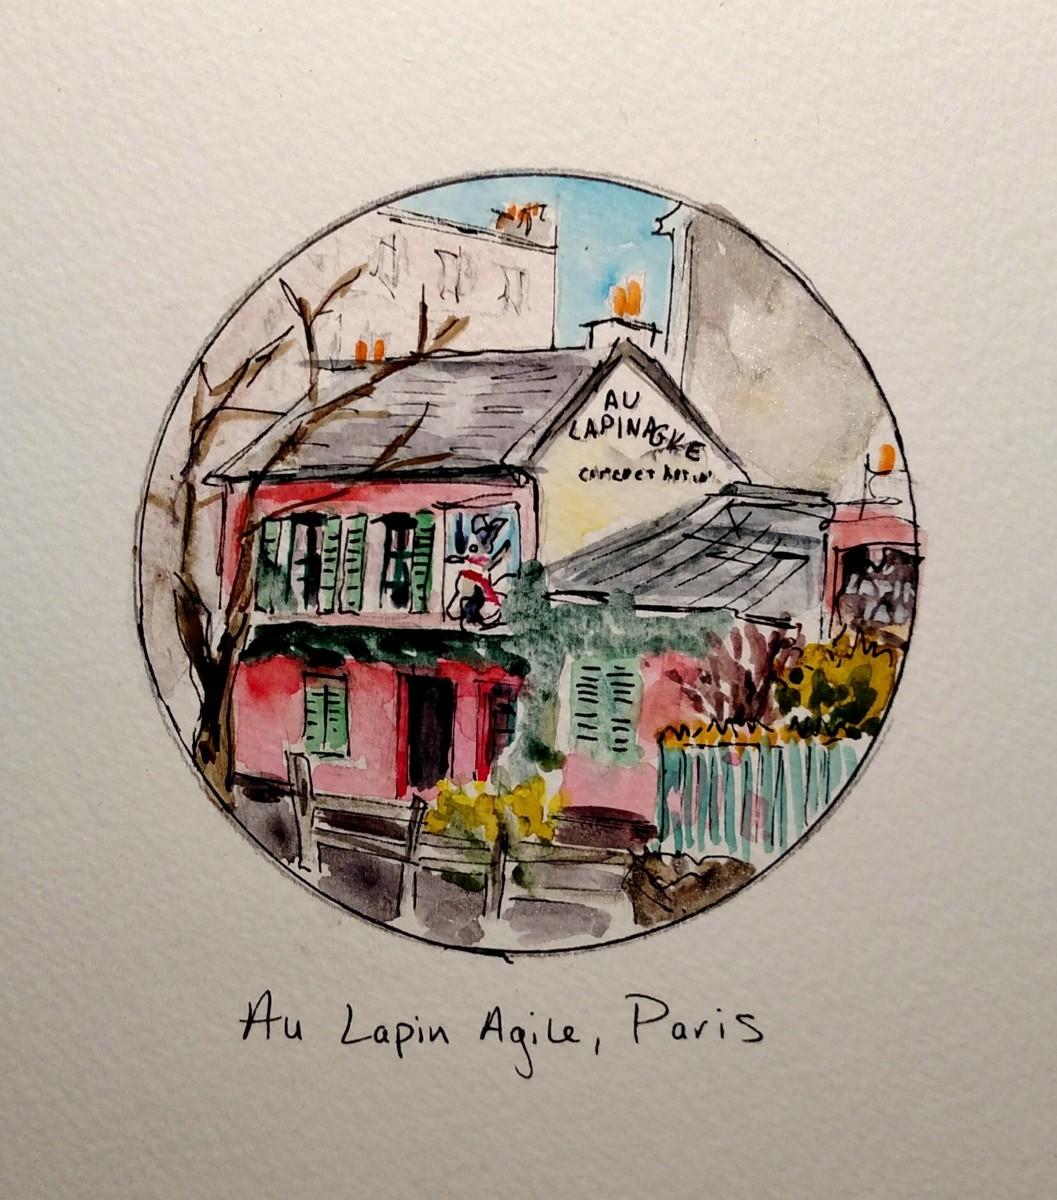 Au Lapin Agile (large view)